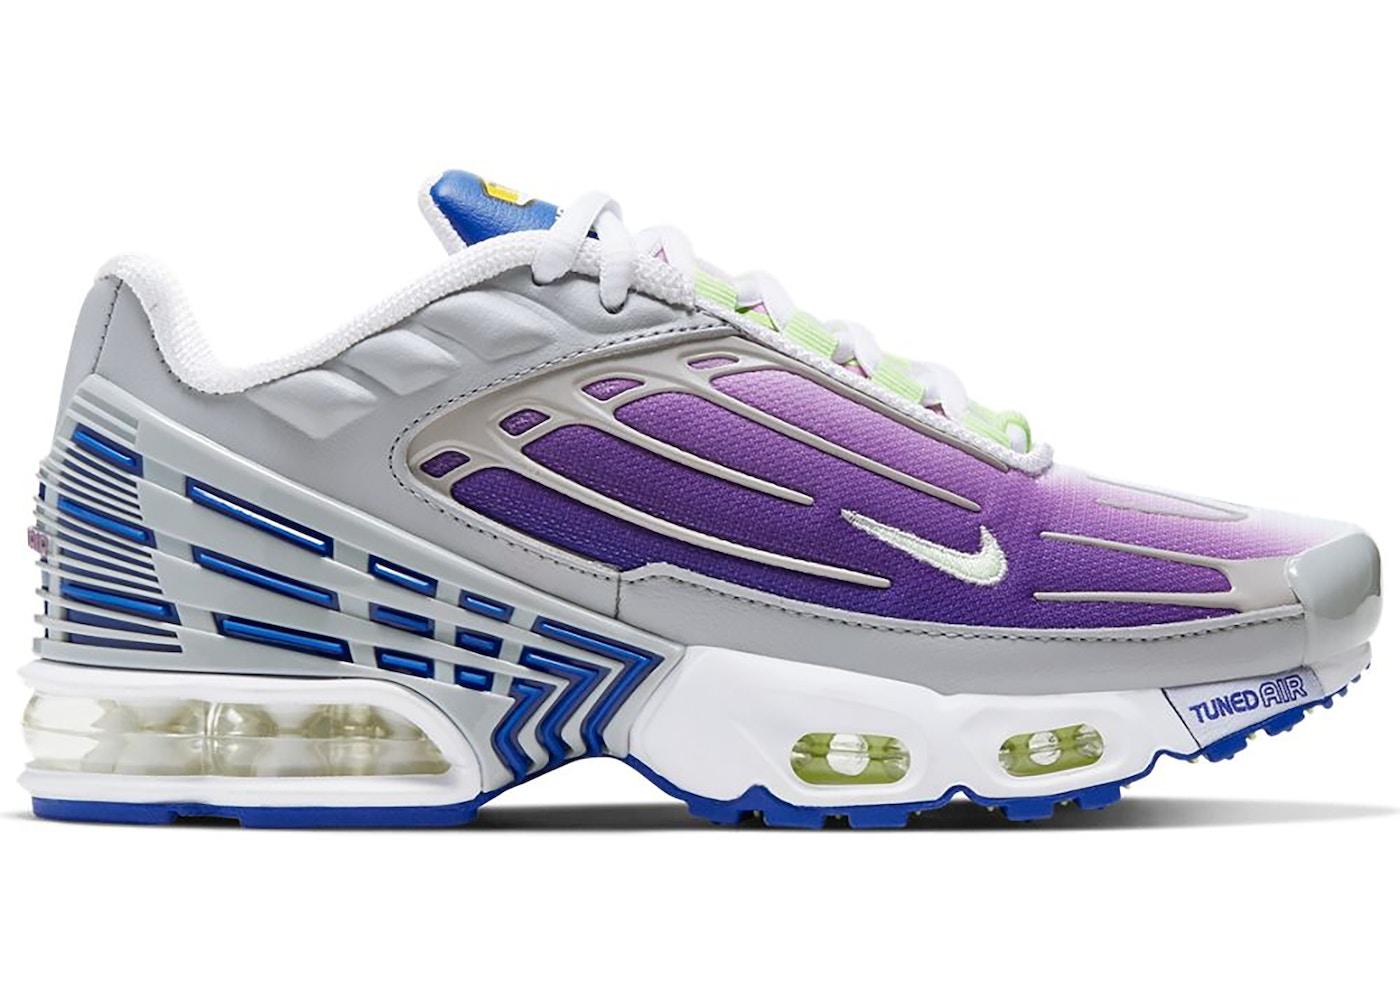 Nike Air Max Plus 3 Purple Nebula (GS) - CD6871-006